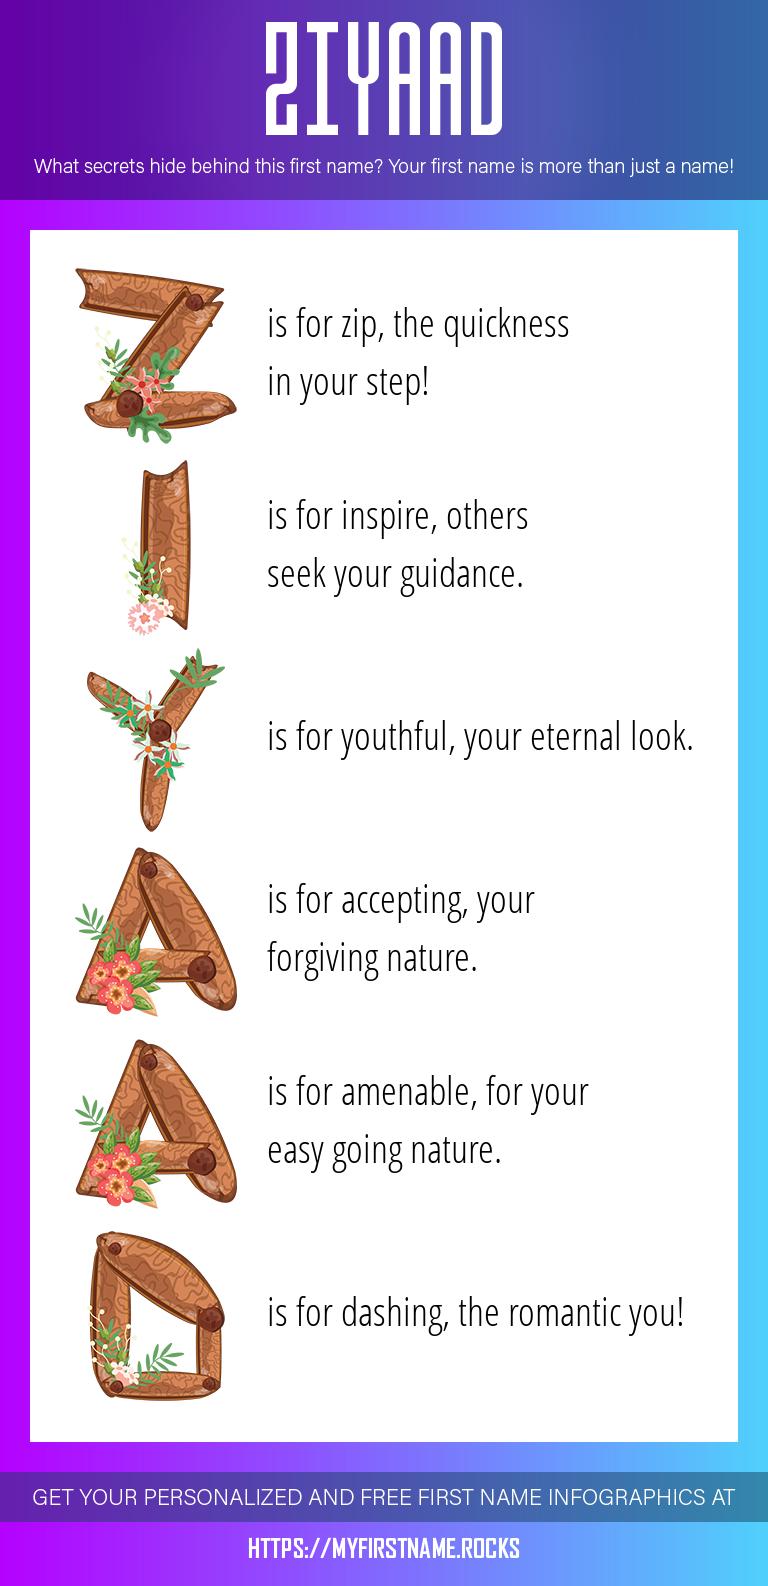 Ziyaad Infographics